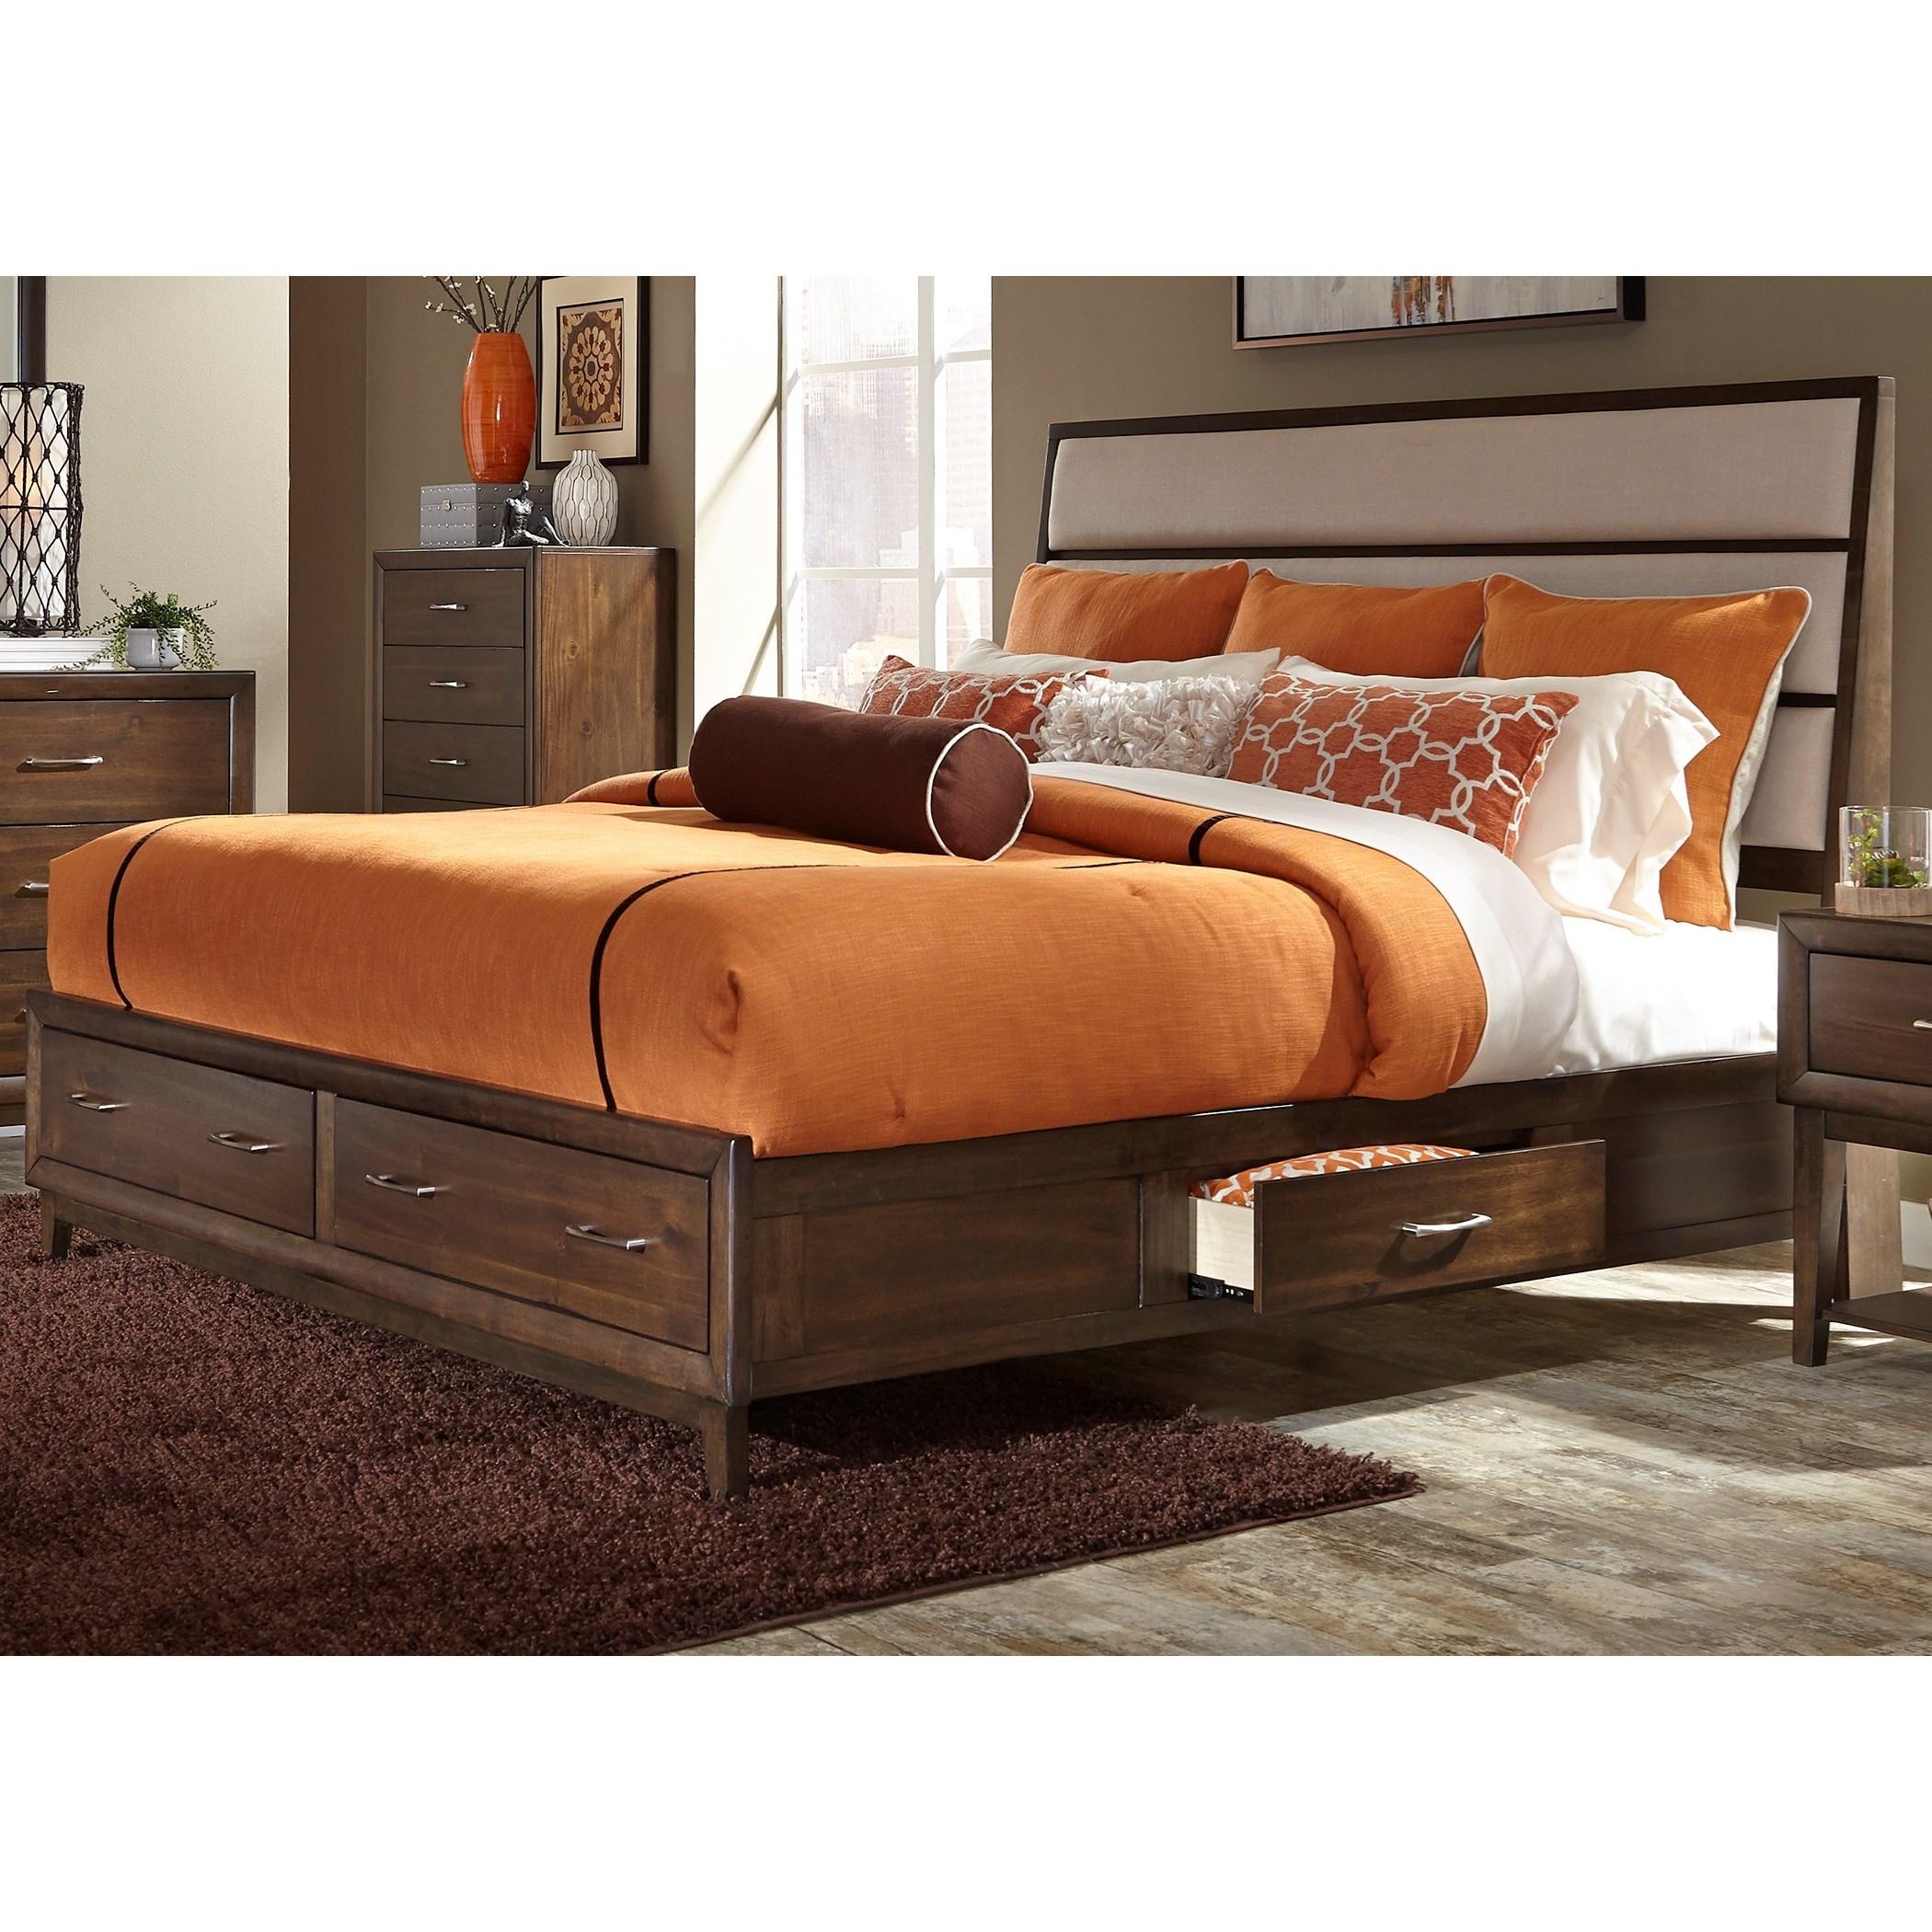 Liberty Furniture Hudson Square Bedroom King Two Sided Storage Bed  - Item Number: 365-BR-K2S